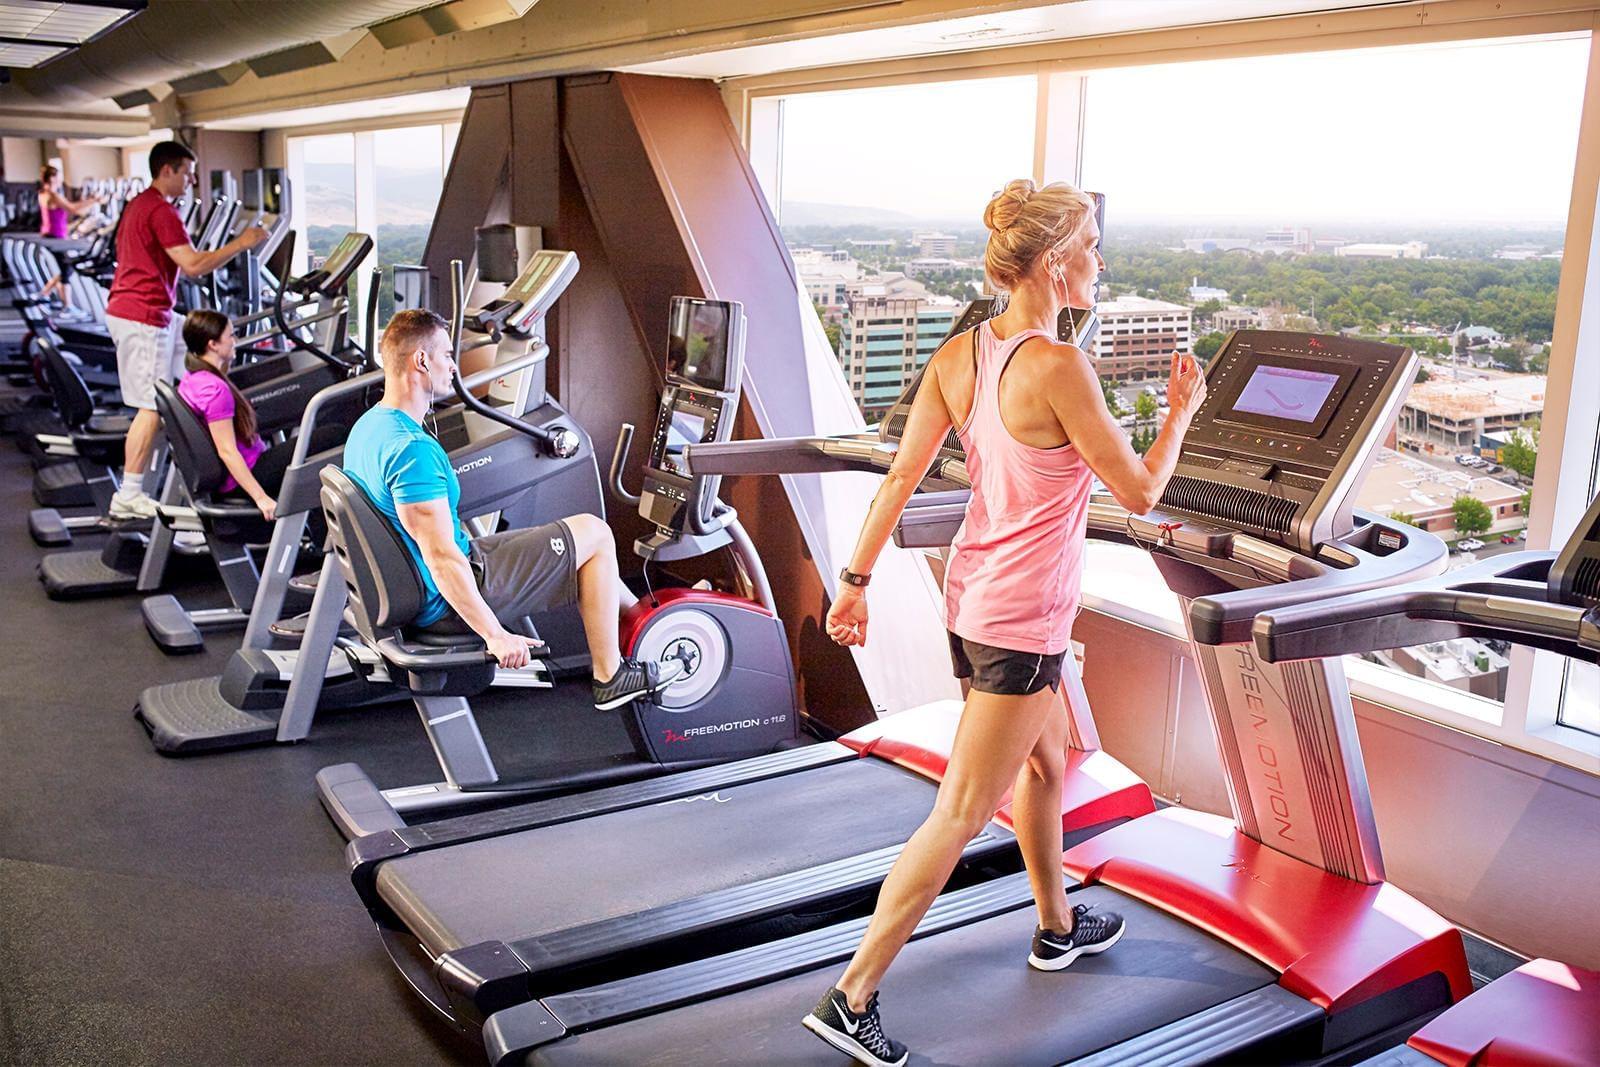 men and women using workout equipment